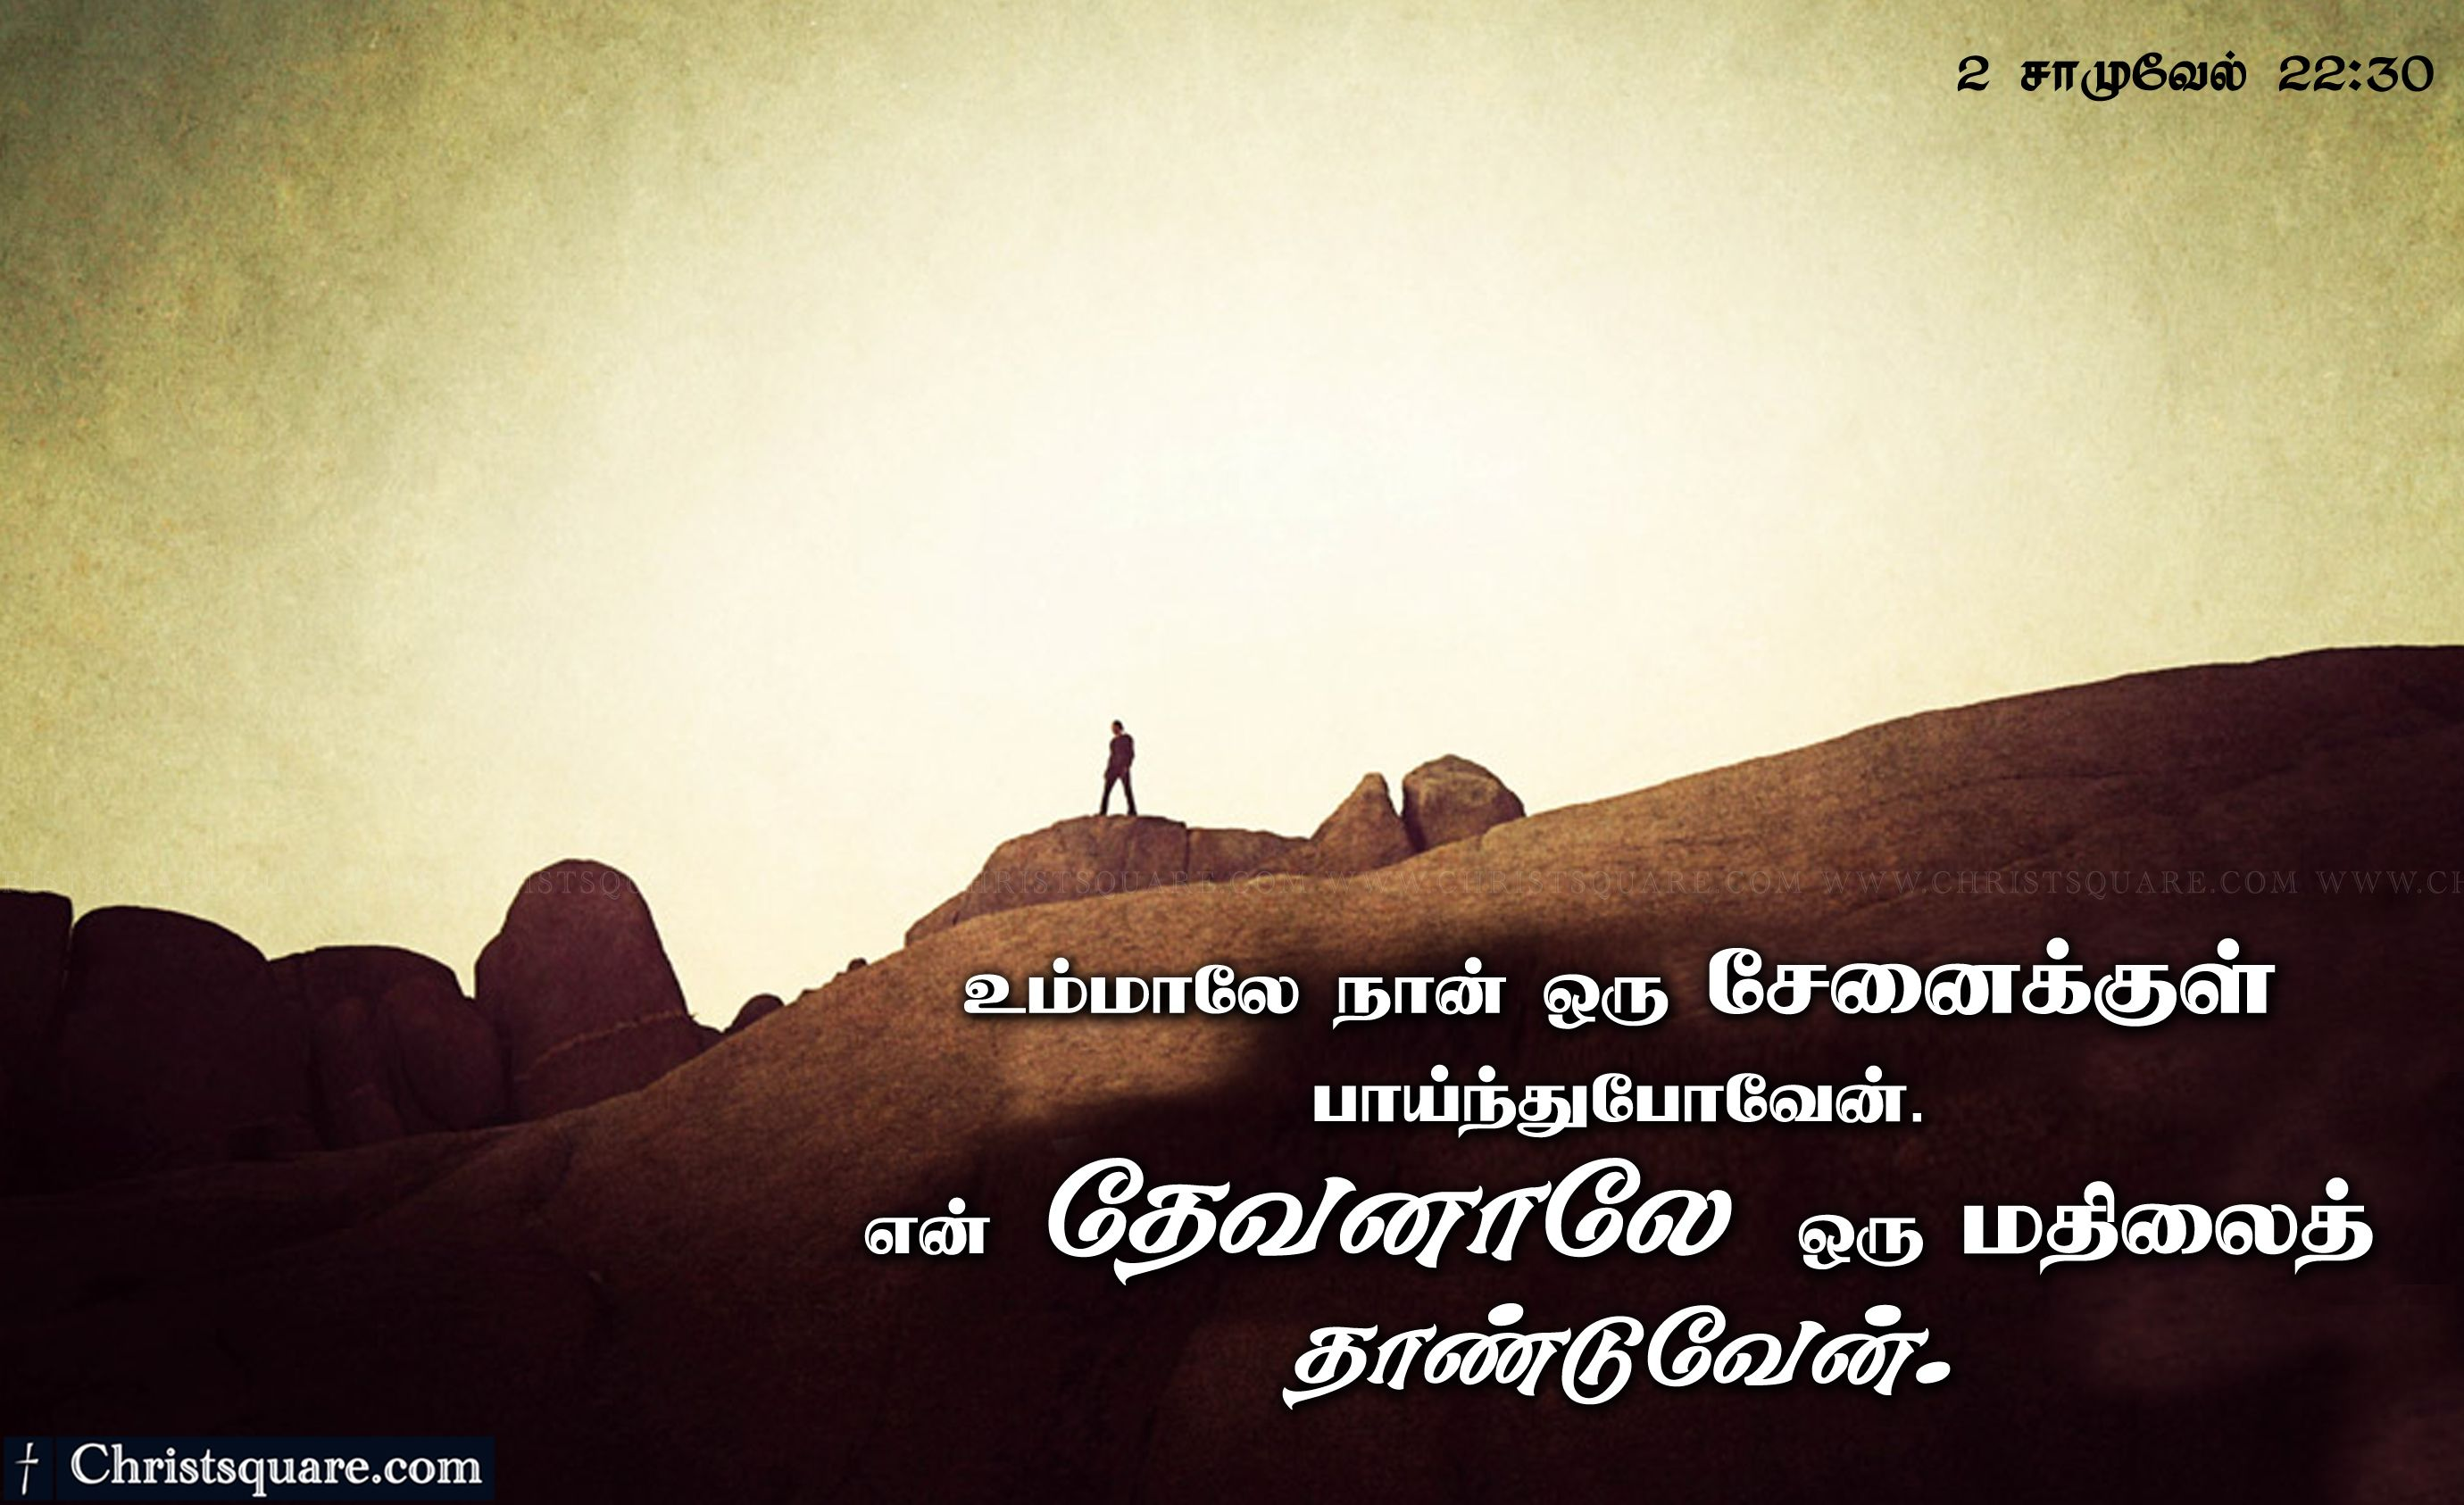 Tamil Christian Tamil Christian Wallpaper Tamil Christian